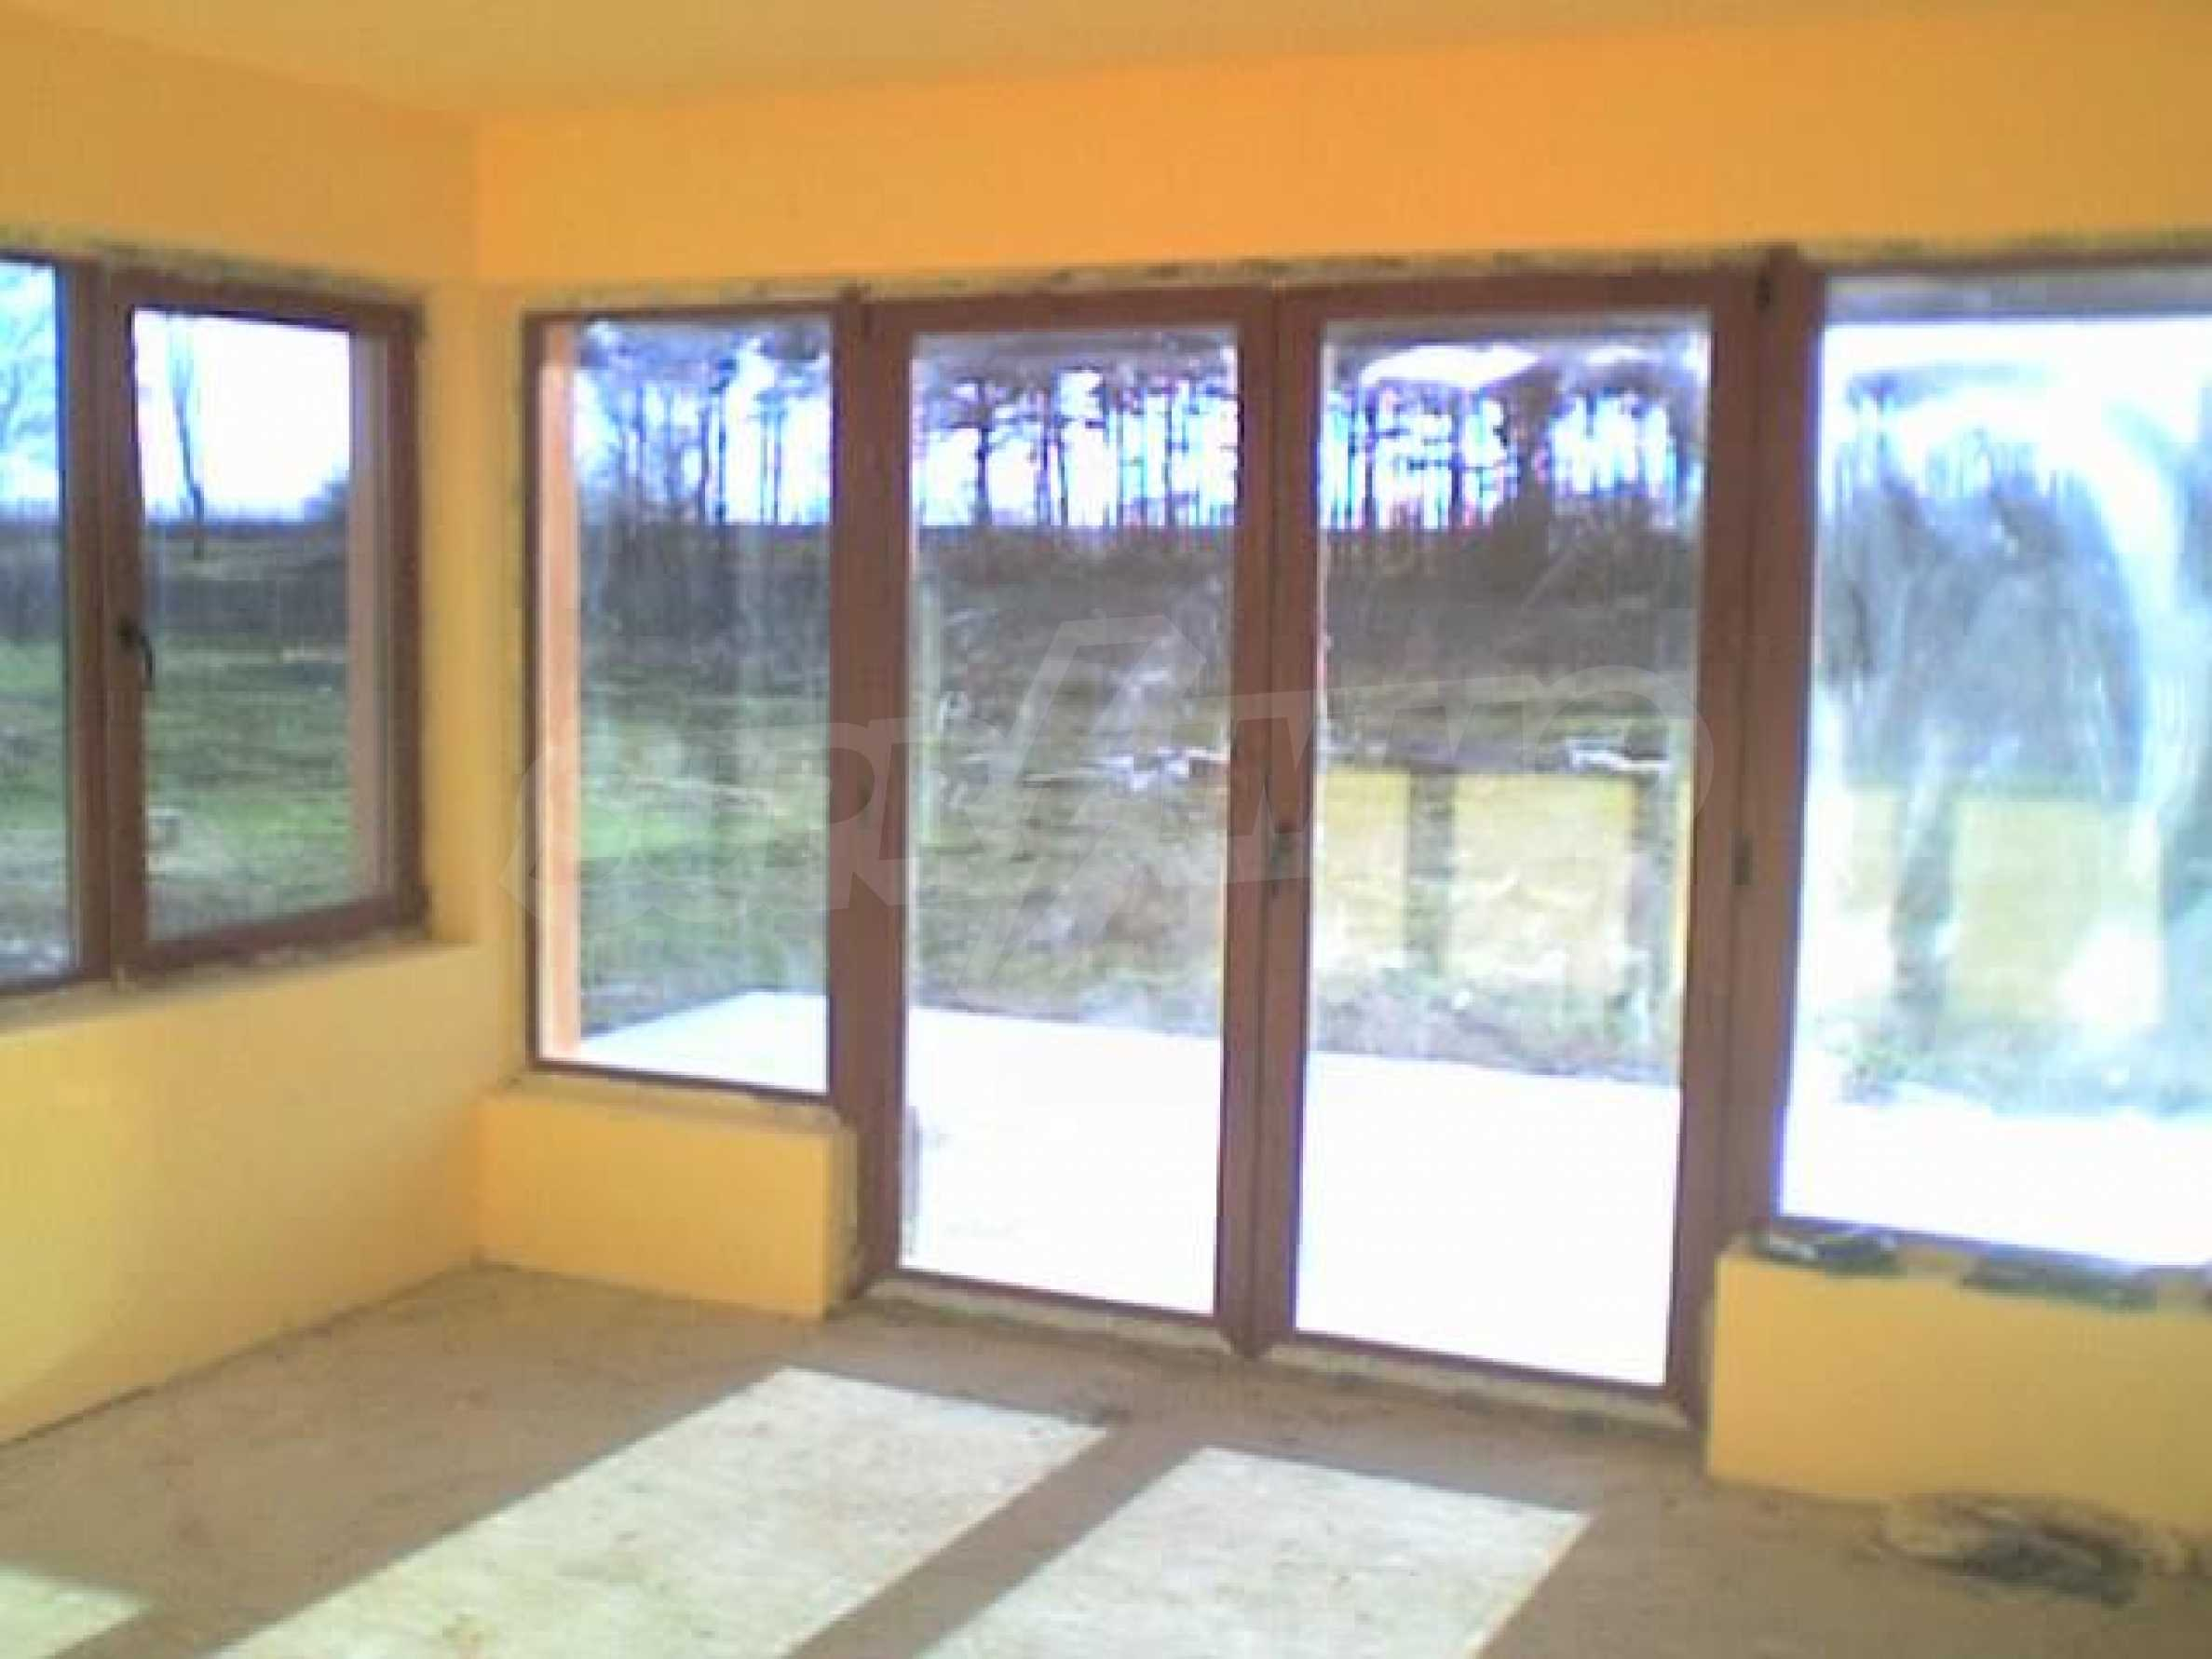 Gurkovo houses 5